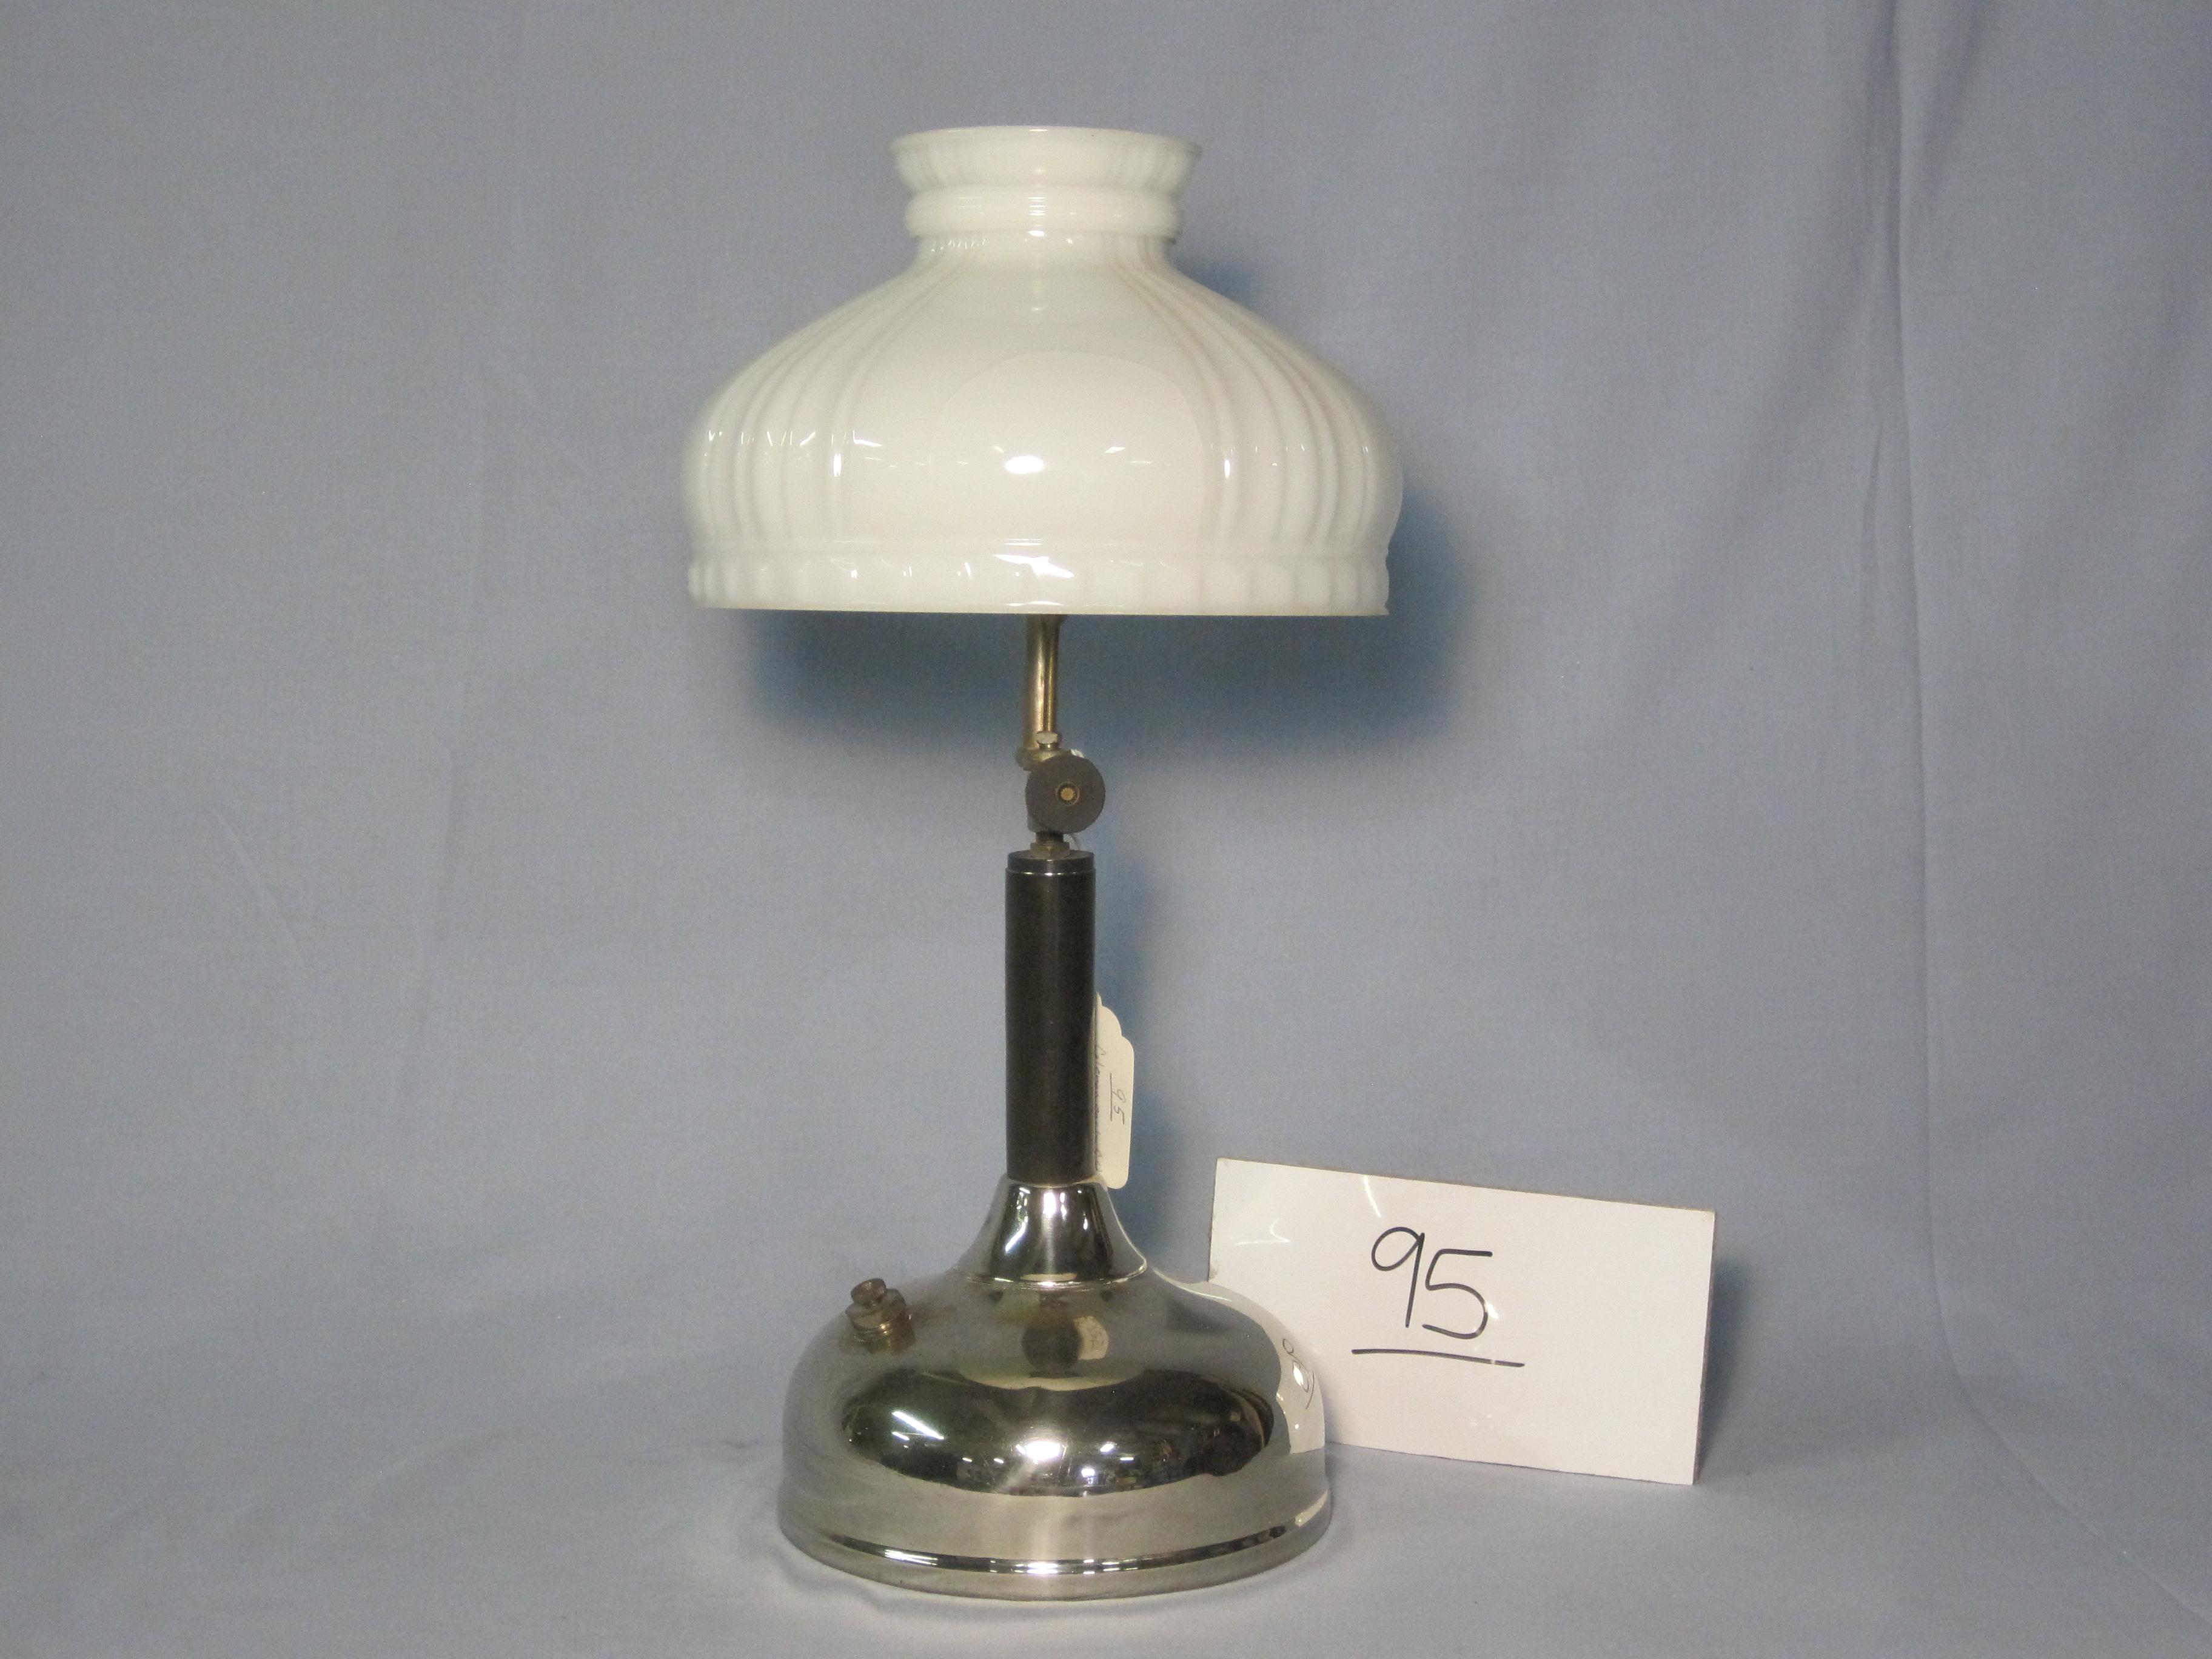 Coleman CQ lamp